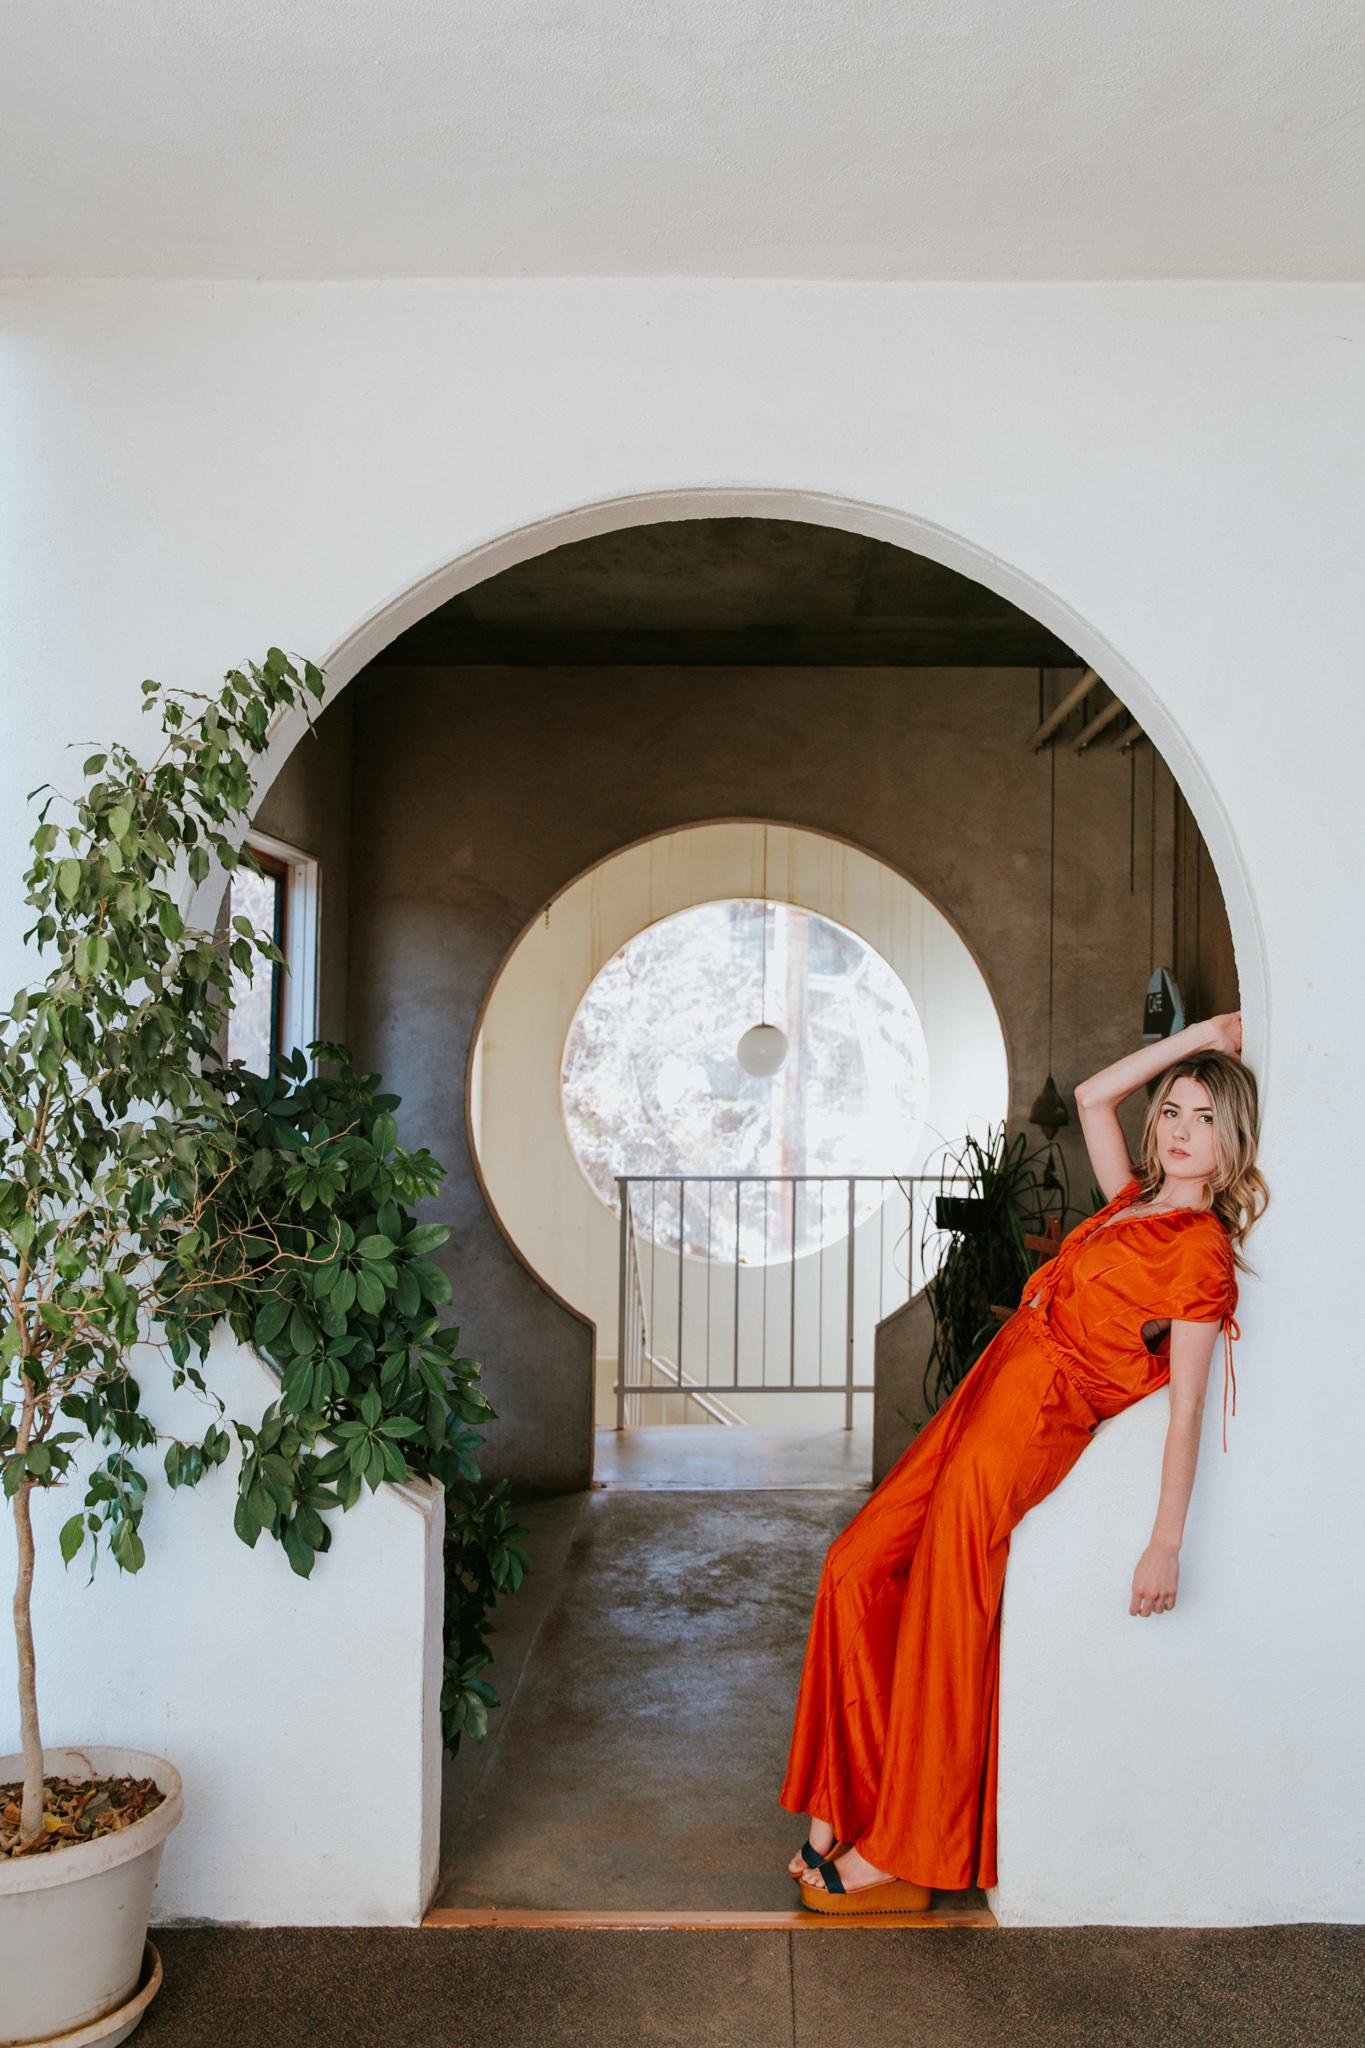 ChelseaScottEvans-Arcosanti-014.jpg